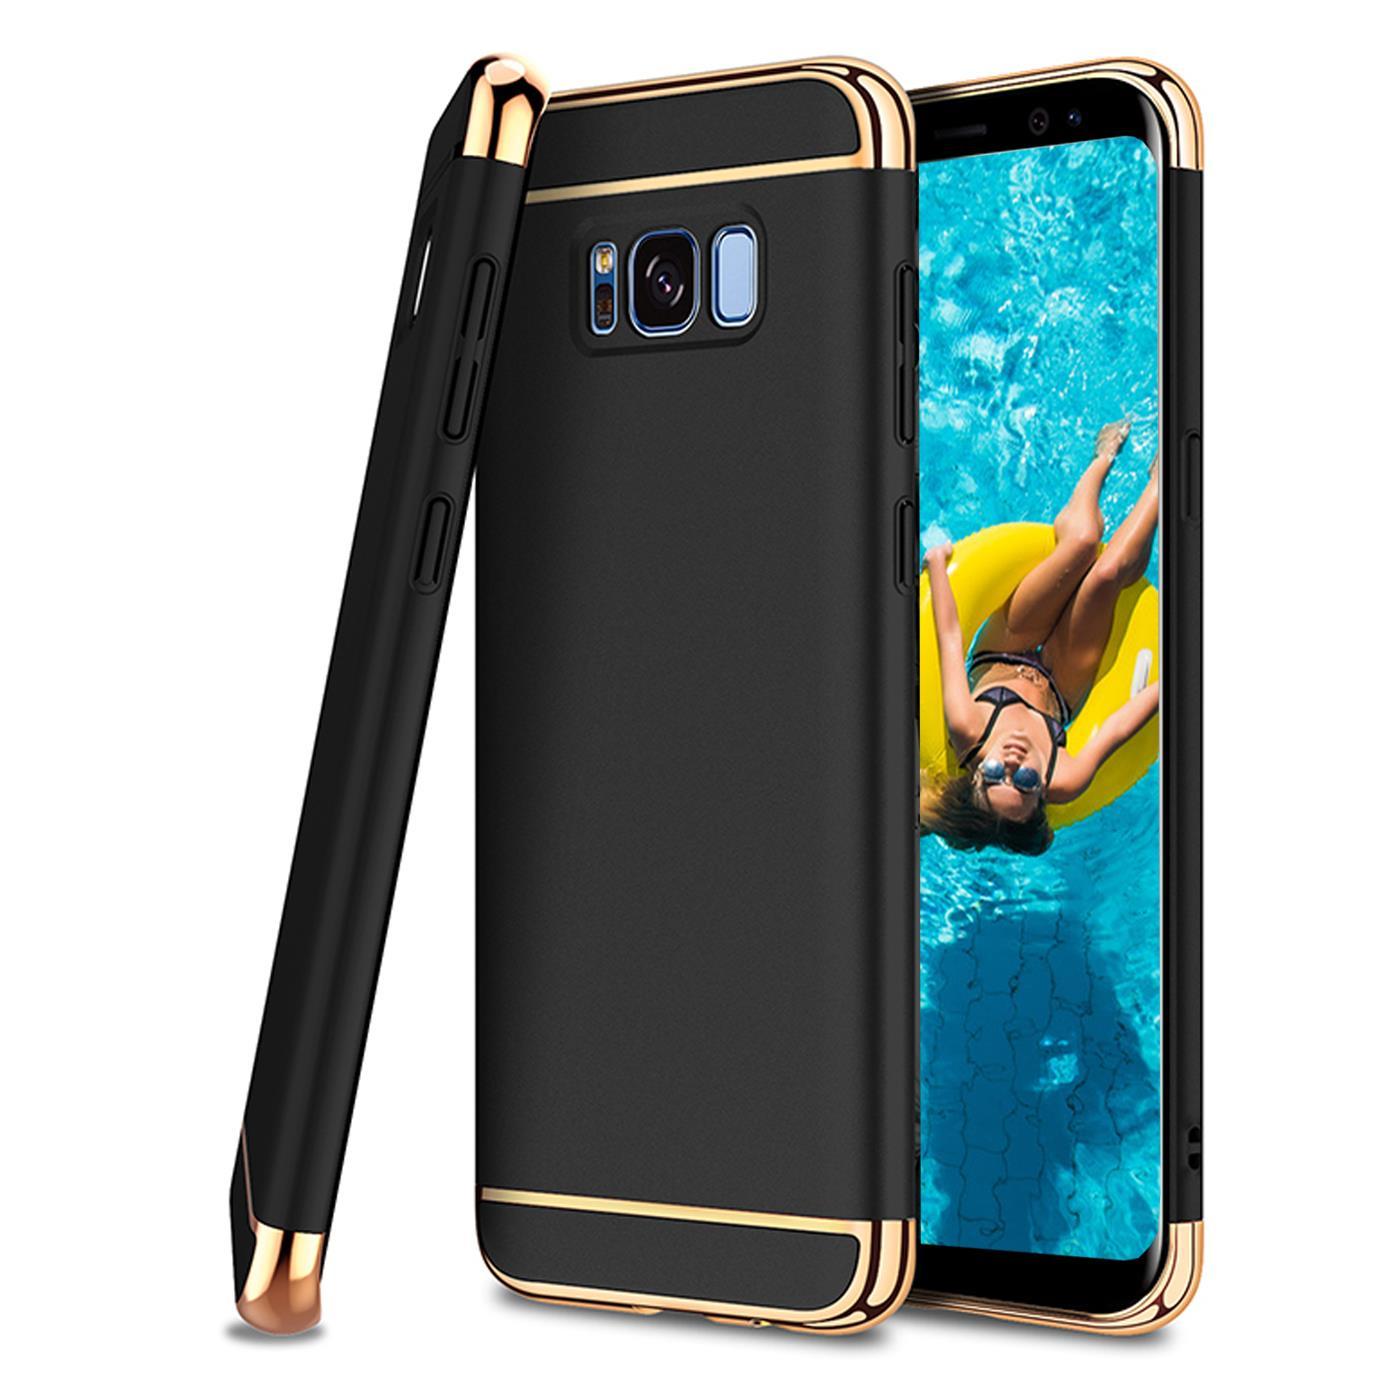 Samsung-Galaxy-S8-Hard-Back-Case-Cover-Thin-Bumper-Slim-Shockproof-Rugged-Thin thumbnail 3